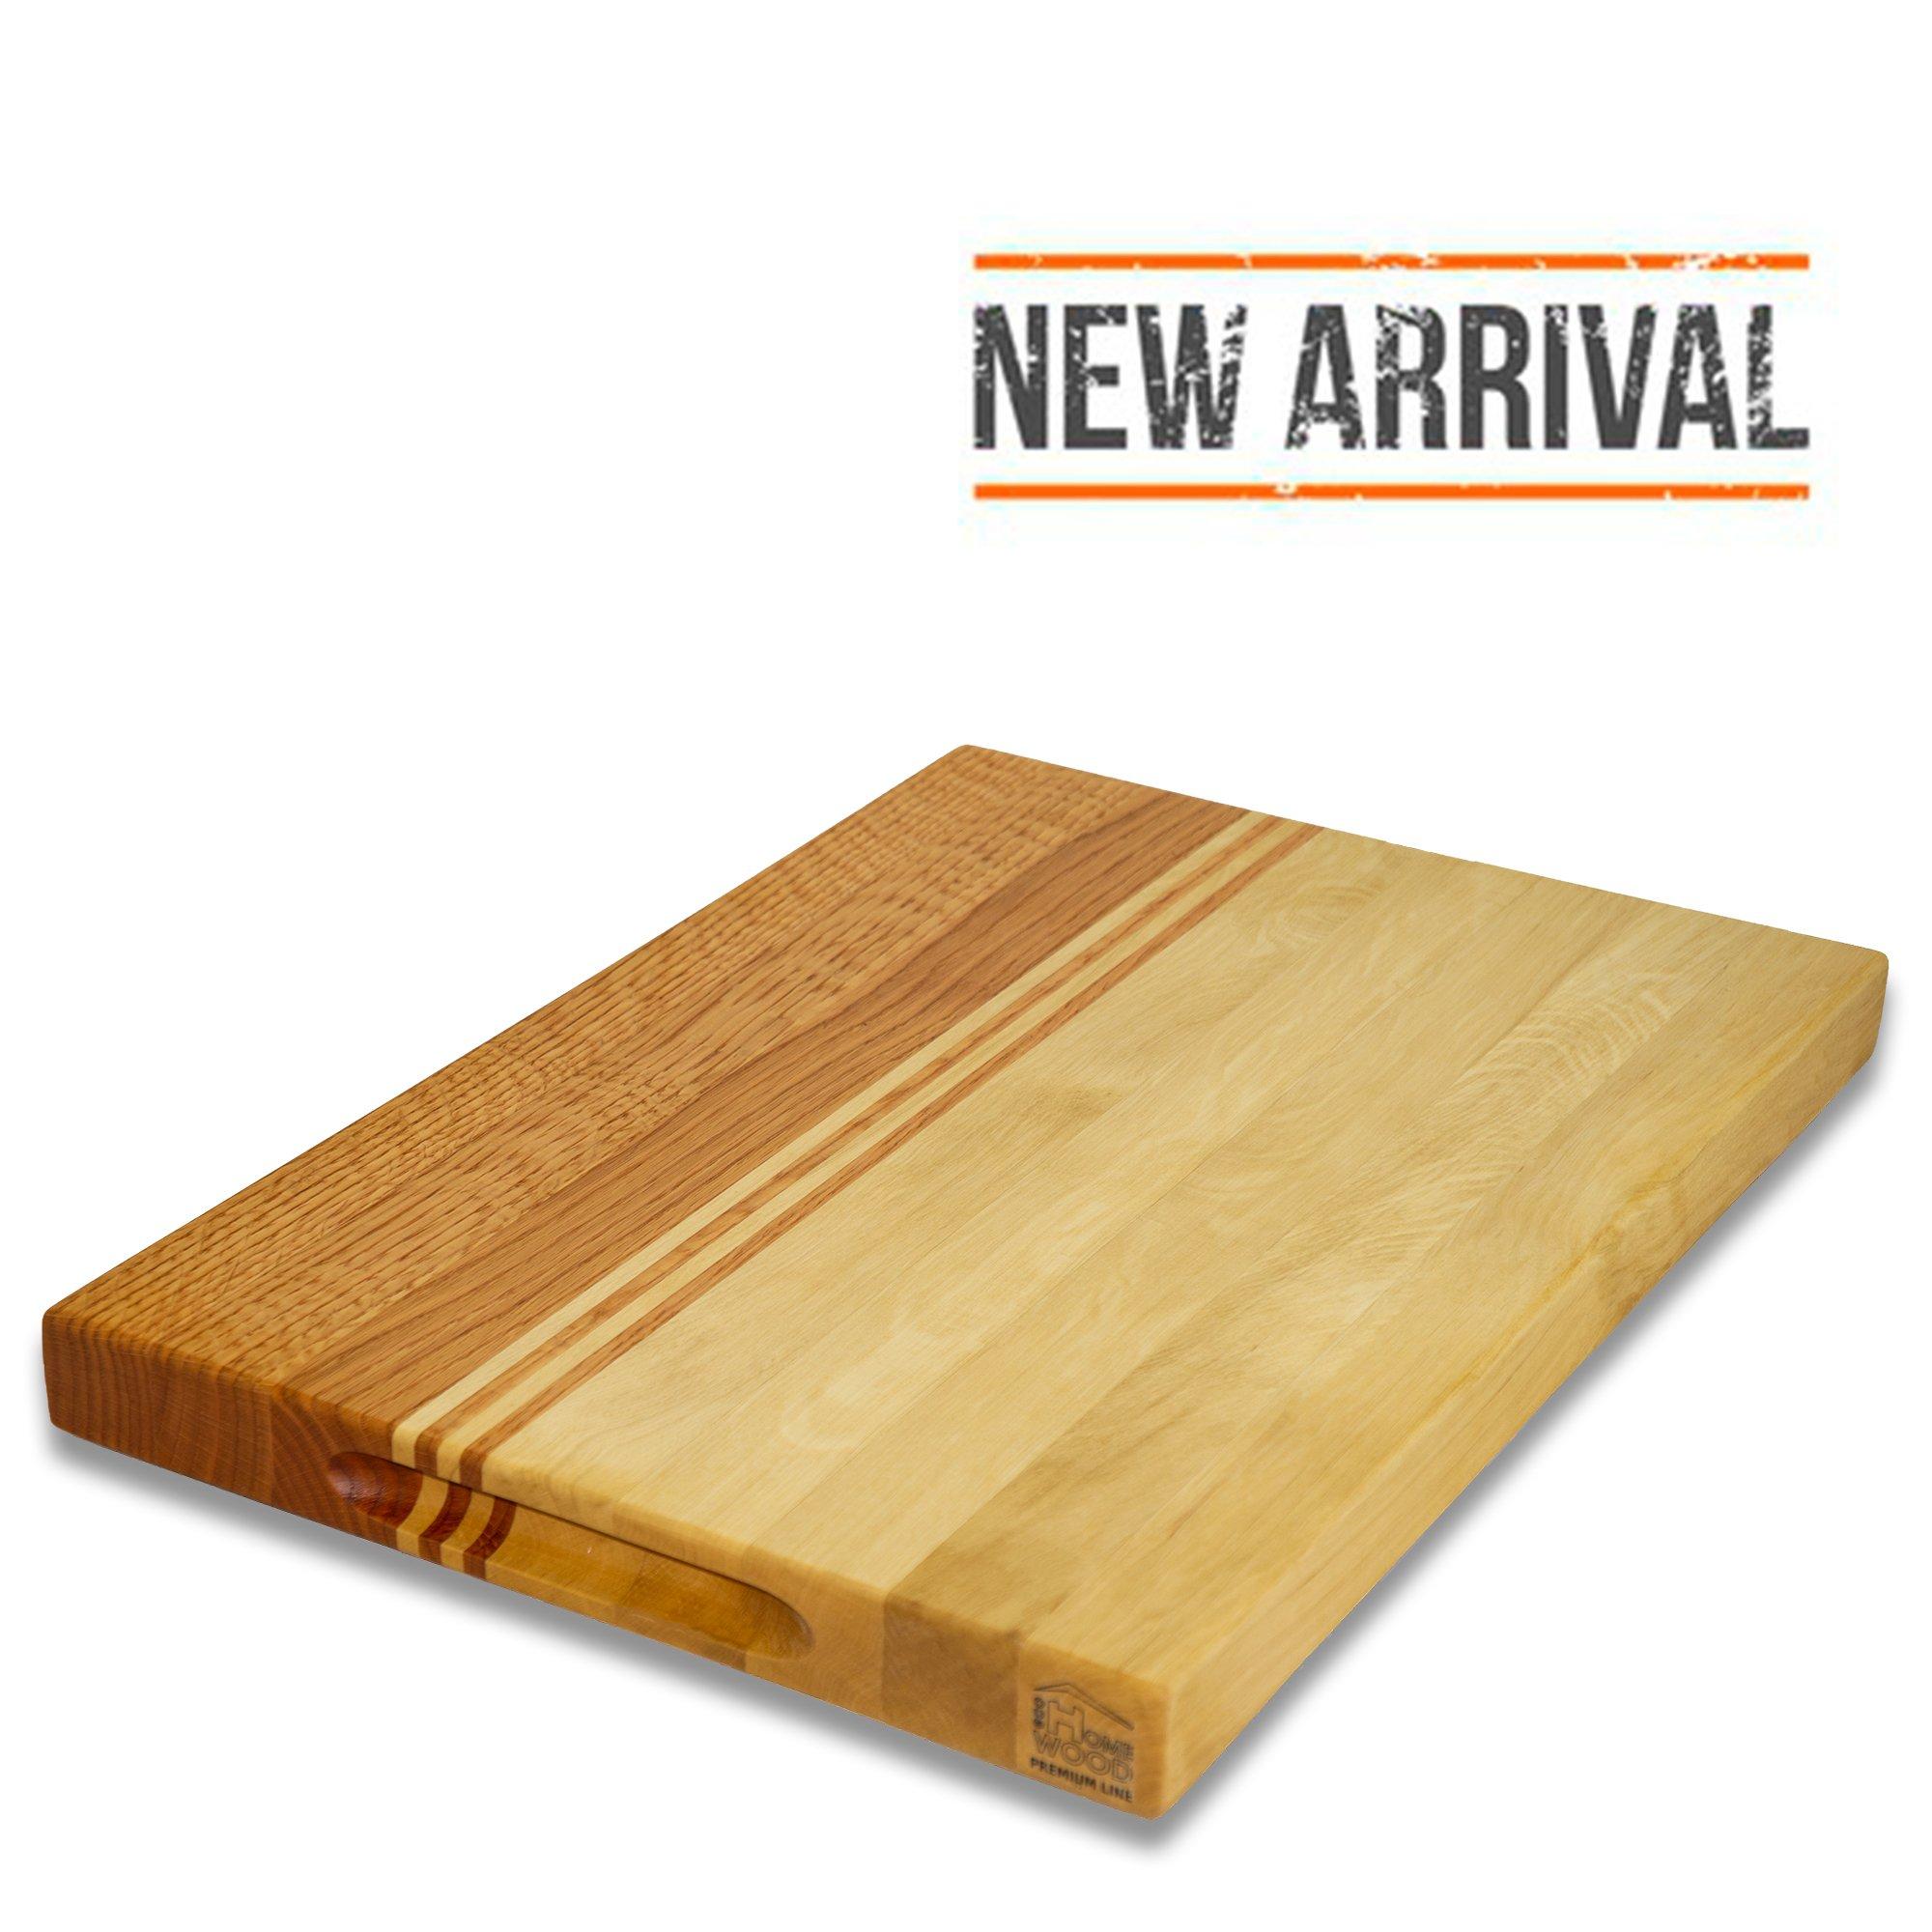 Heavy duty wood cutting board-Wooden chopping board| Wood cutting boards with feet - Wood butcher block Cutting board Edge grain cutting board for kitchen Wooden chopping block Antibacterial Non slip